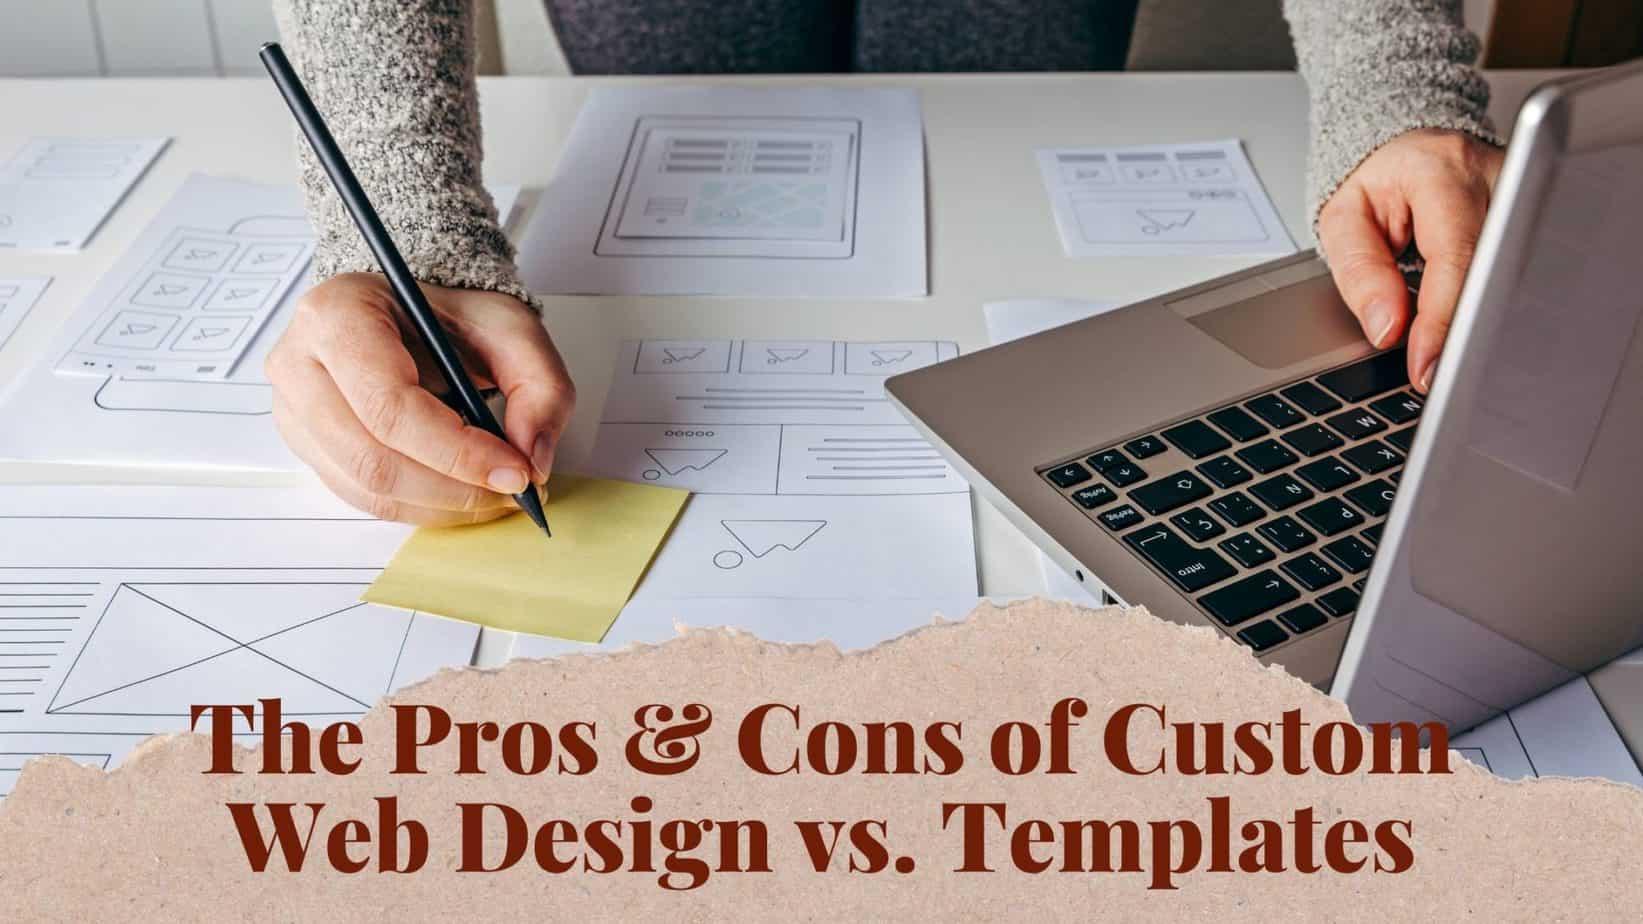 The Pros & Cons of Custom Web Design vs. Templates